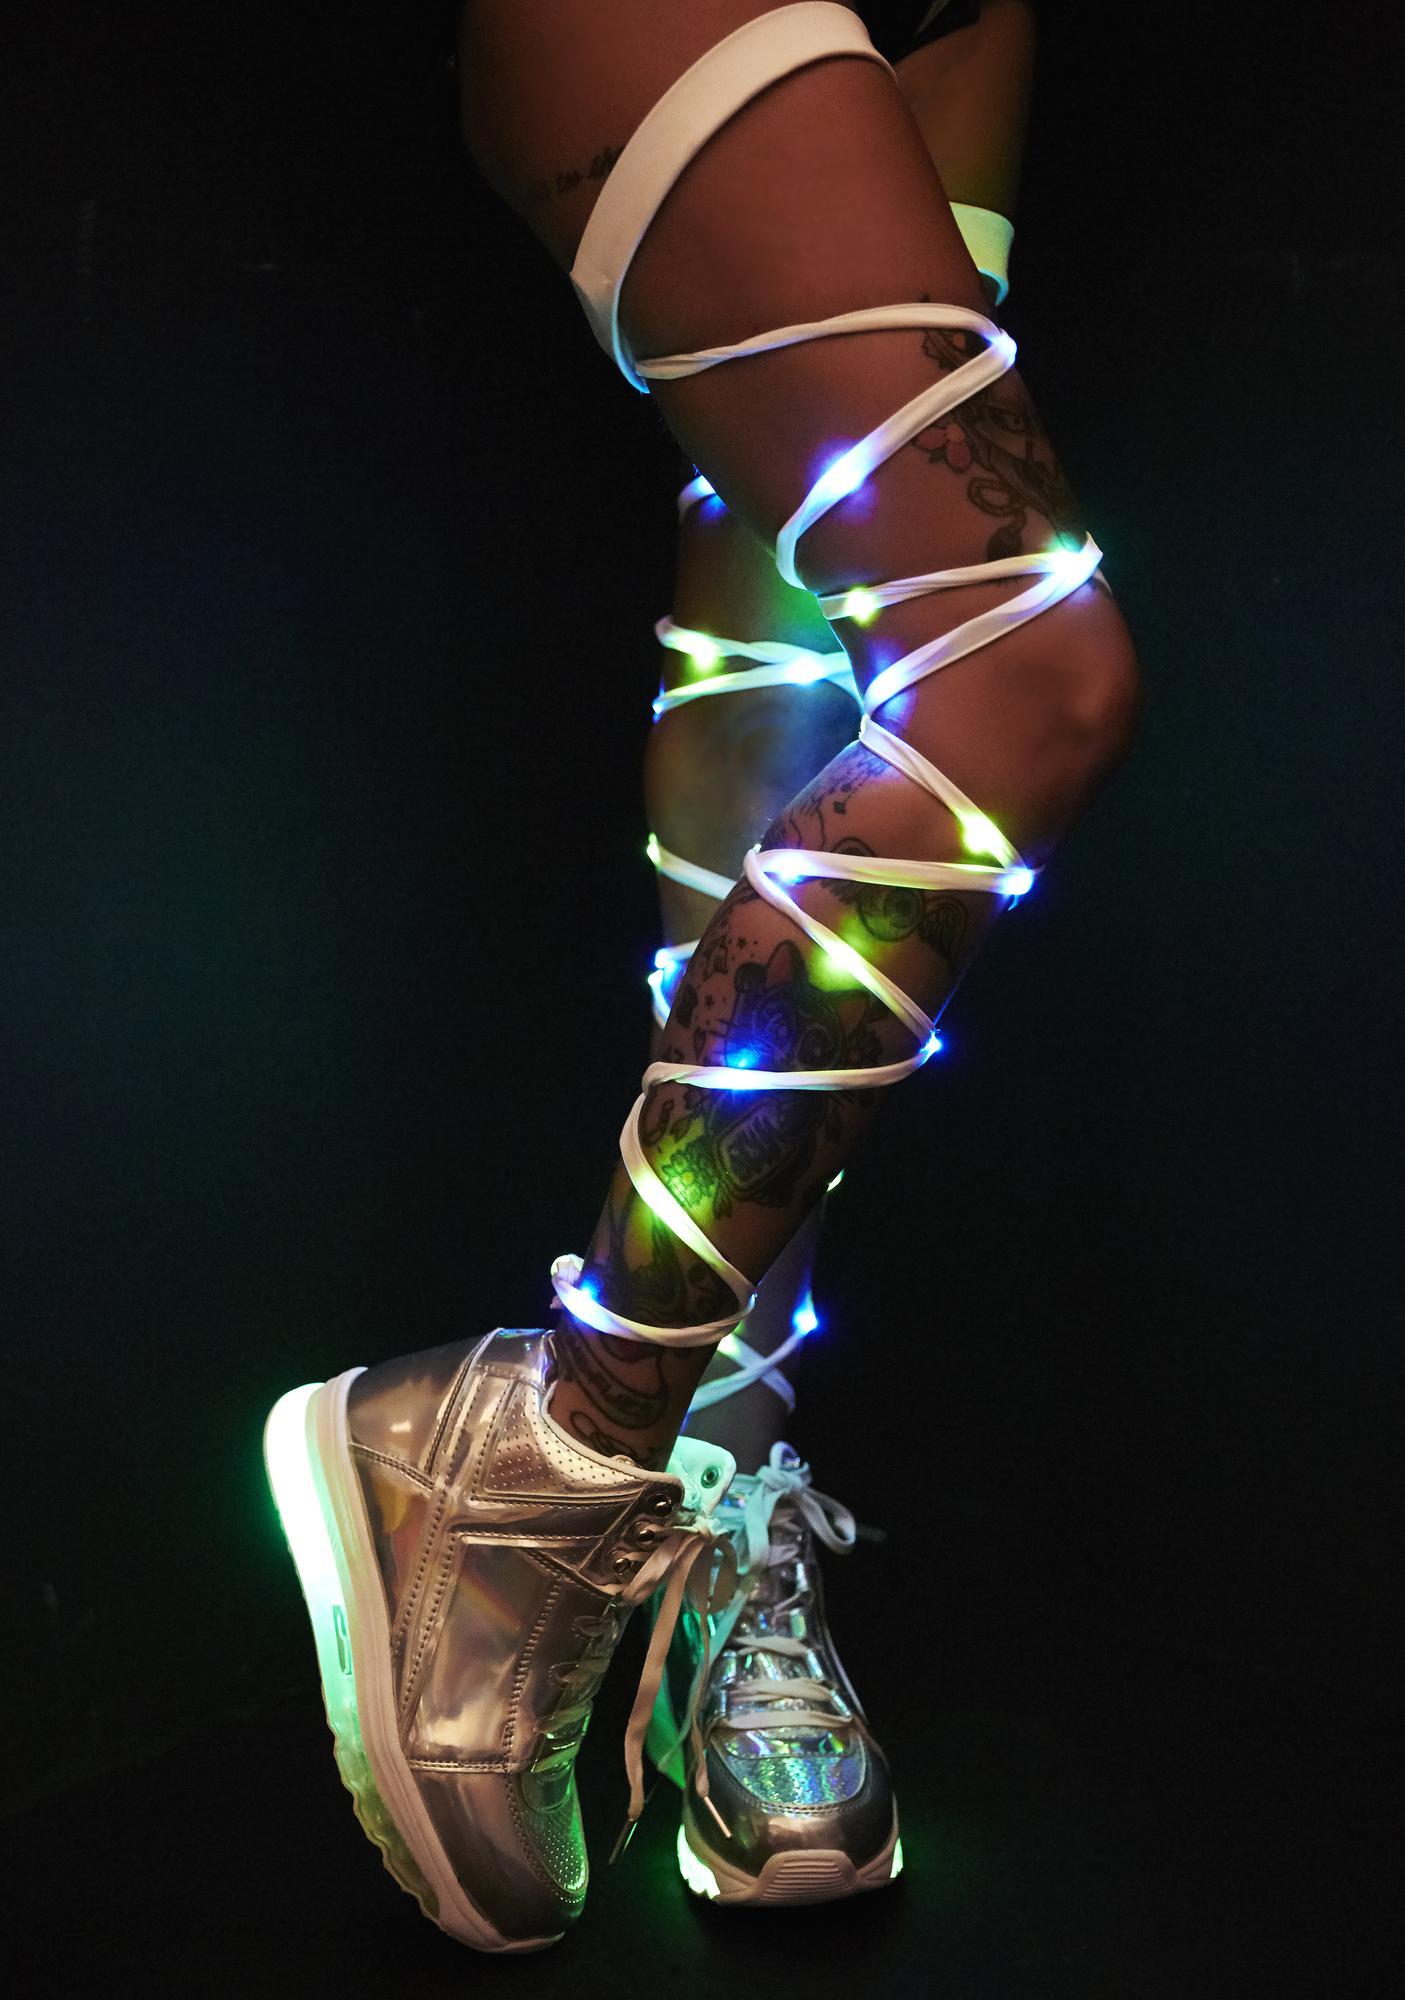 J Valentine Mermaid Light-Up Leg Wraps